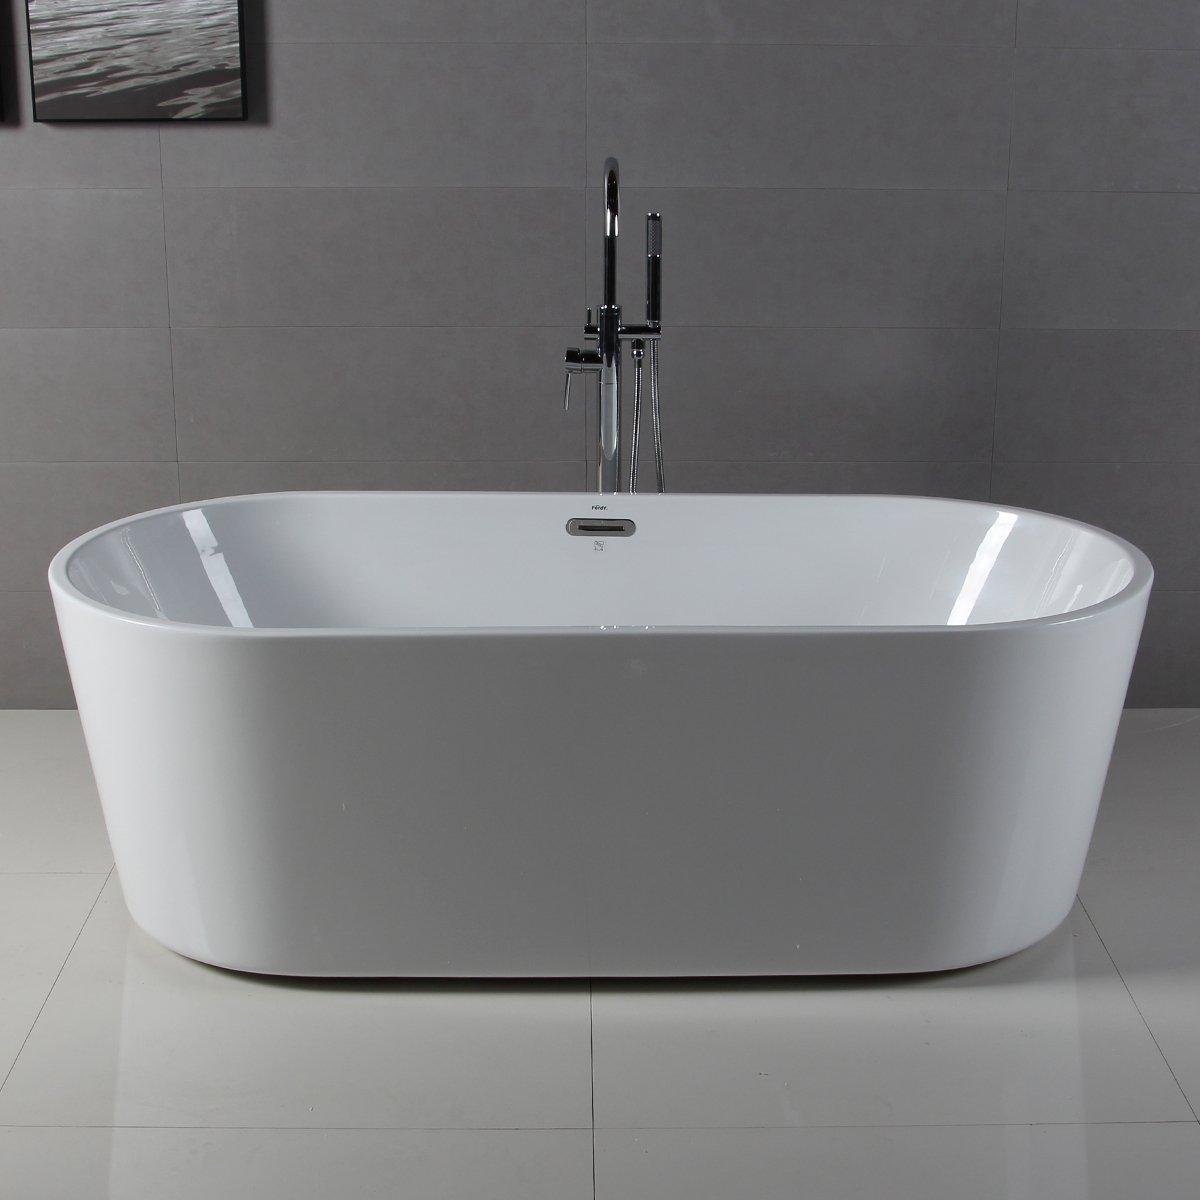 FerdY 59\'\' Acrylic Stand Alone Bathtub, White Modern Freestanding ...